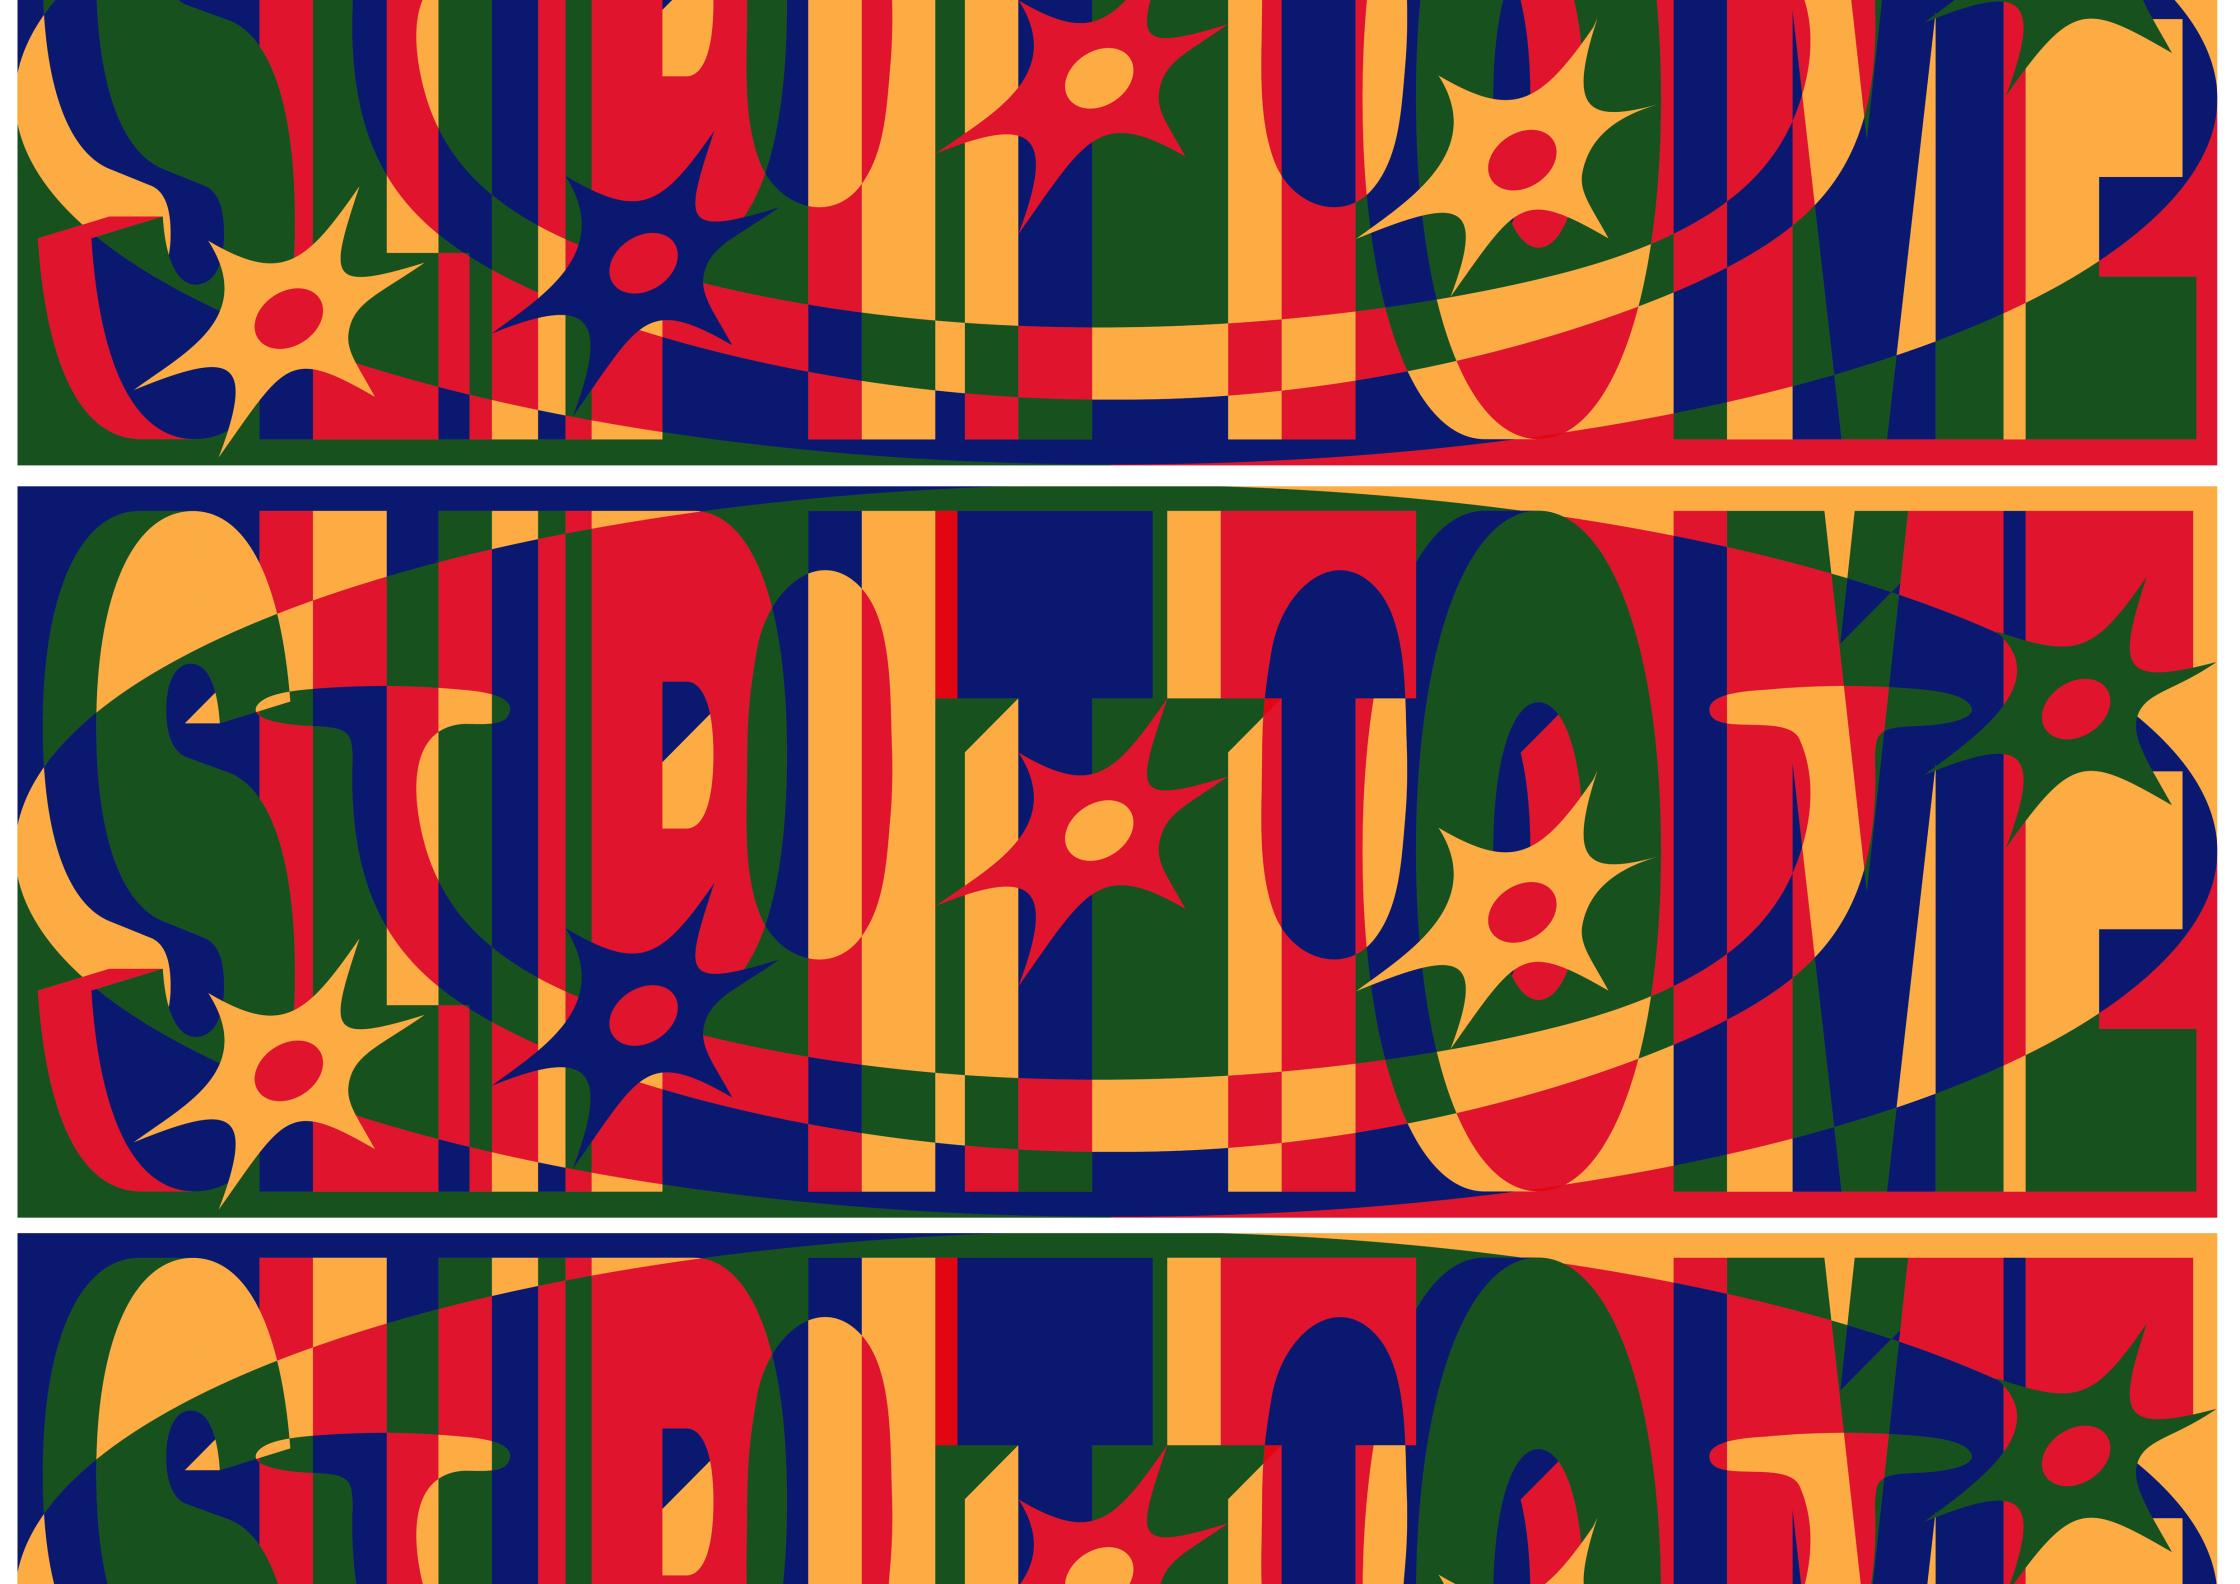 OilTray_HYT_Image1.jpg